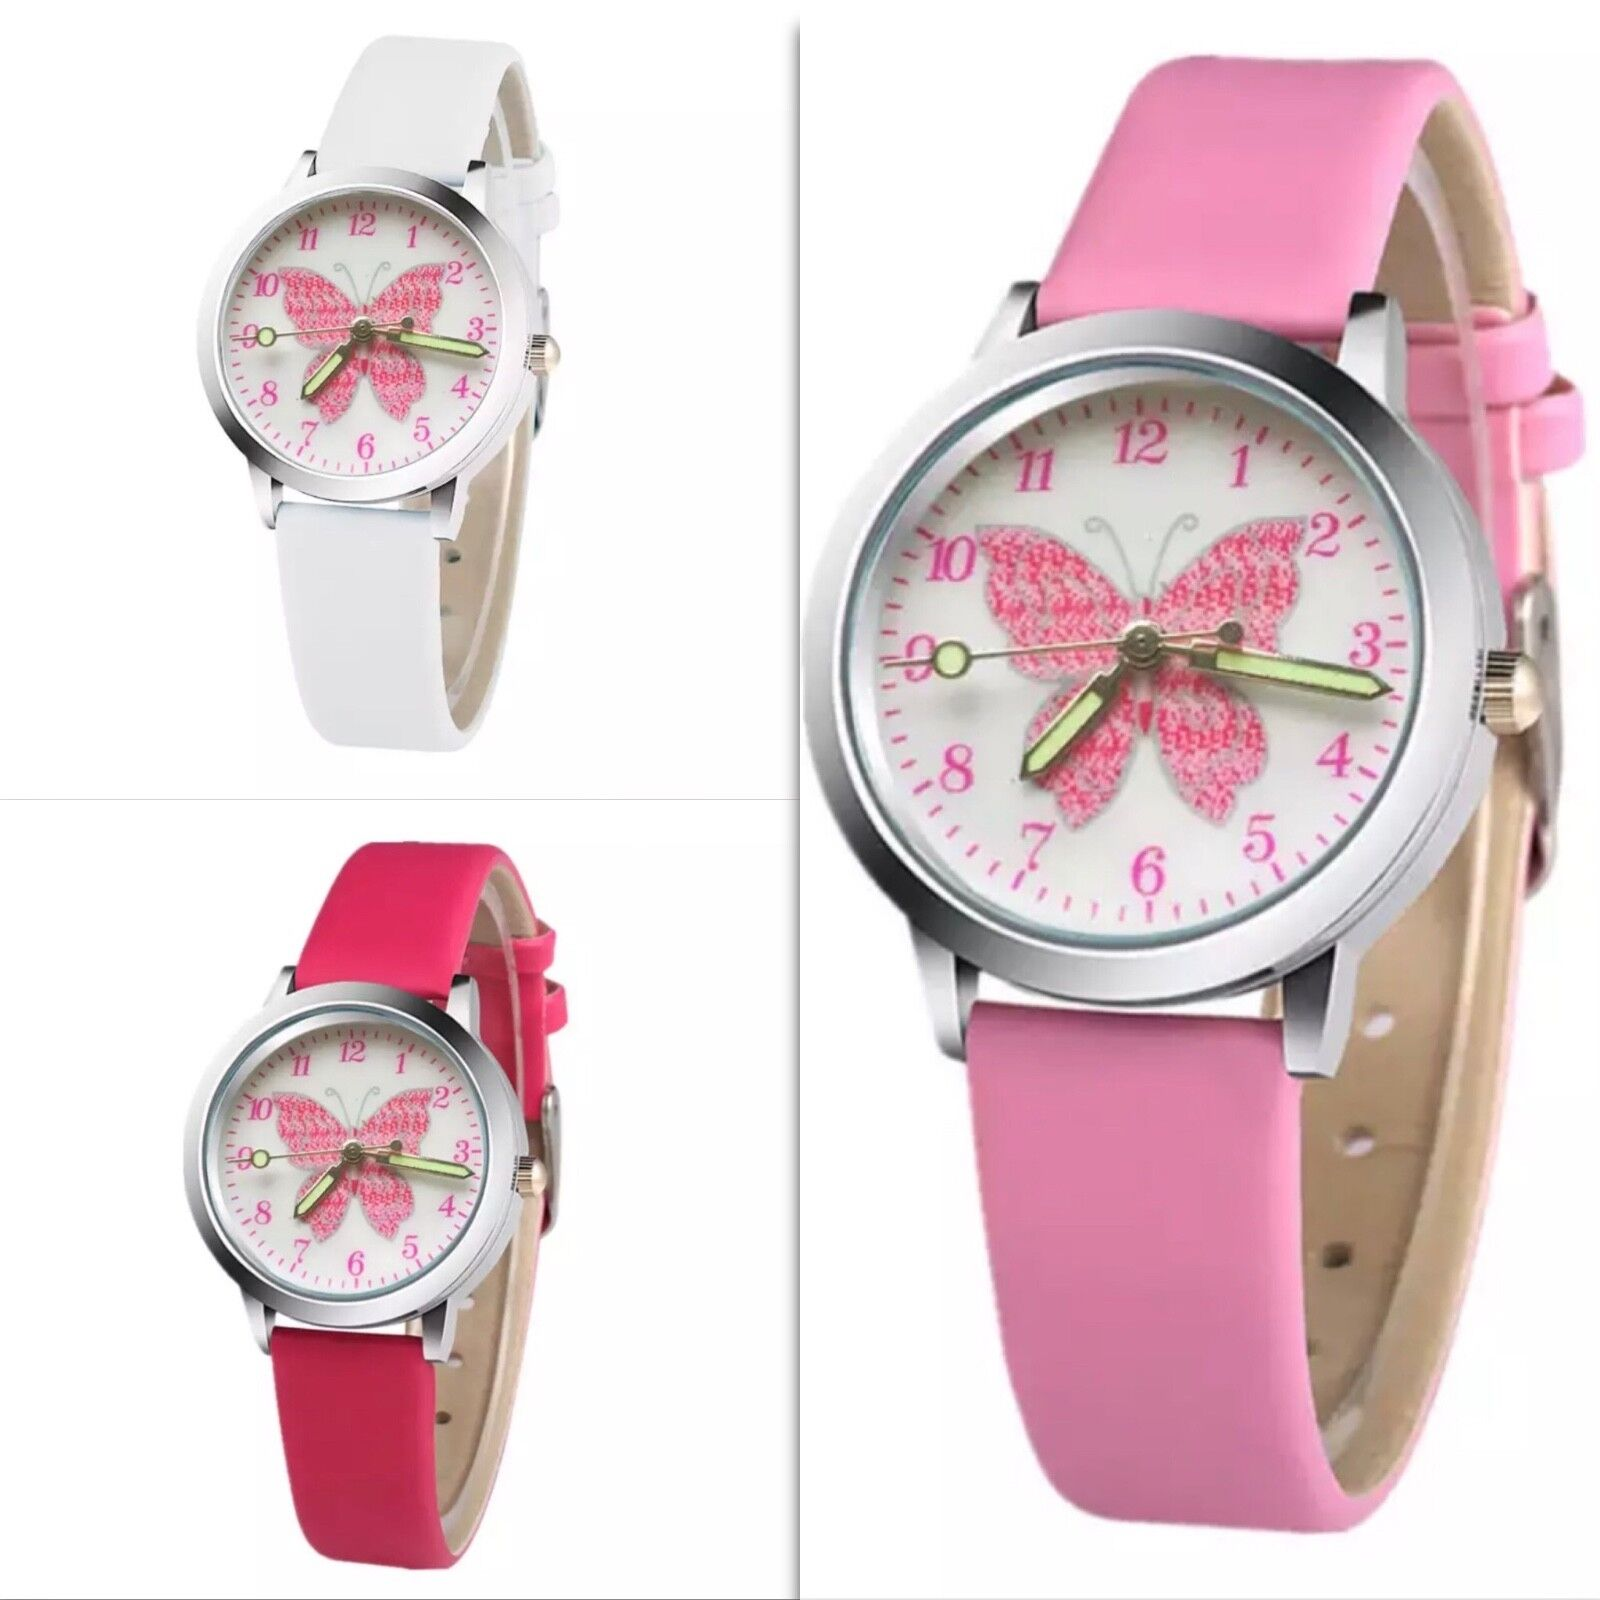 Armbanduhr Kinderuhr Uhr Kinder Mädchen silber Schmetterling pink rosa weiß